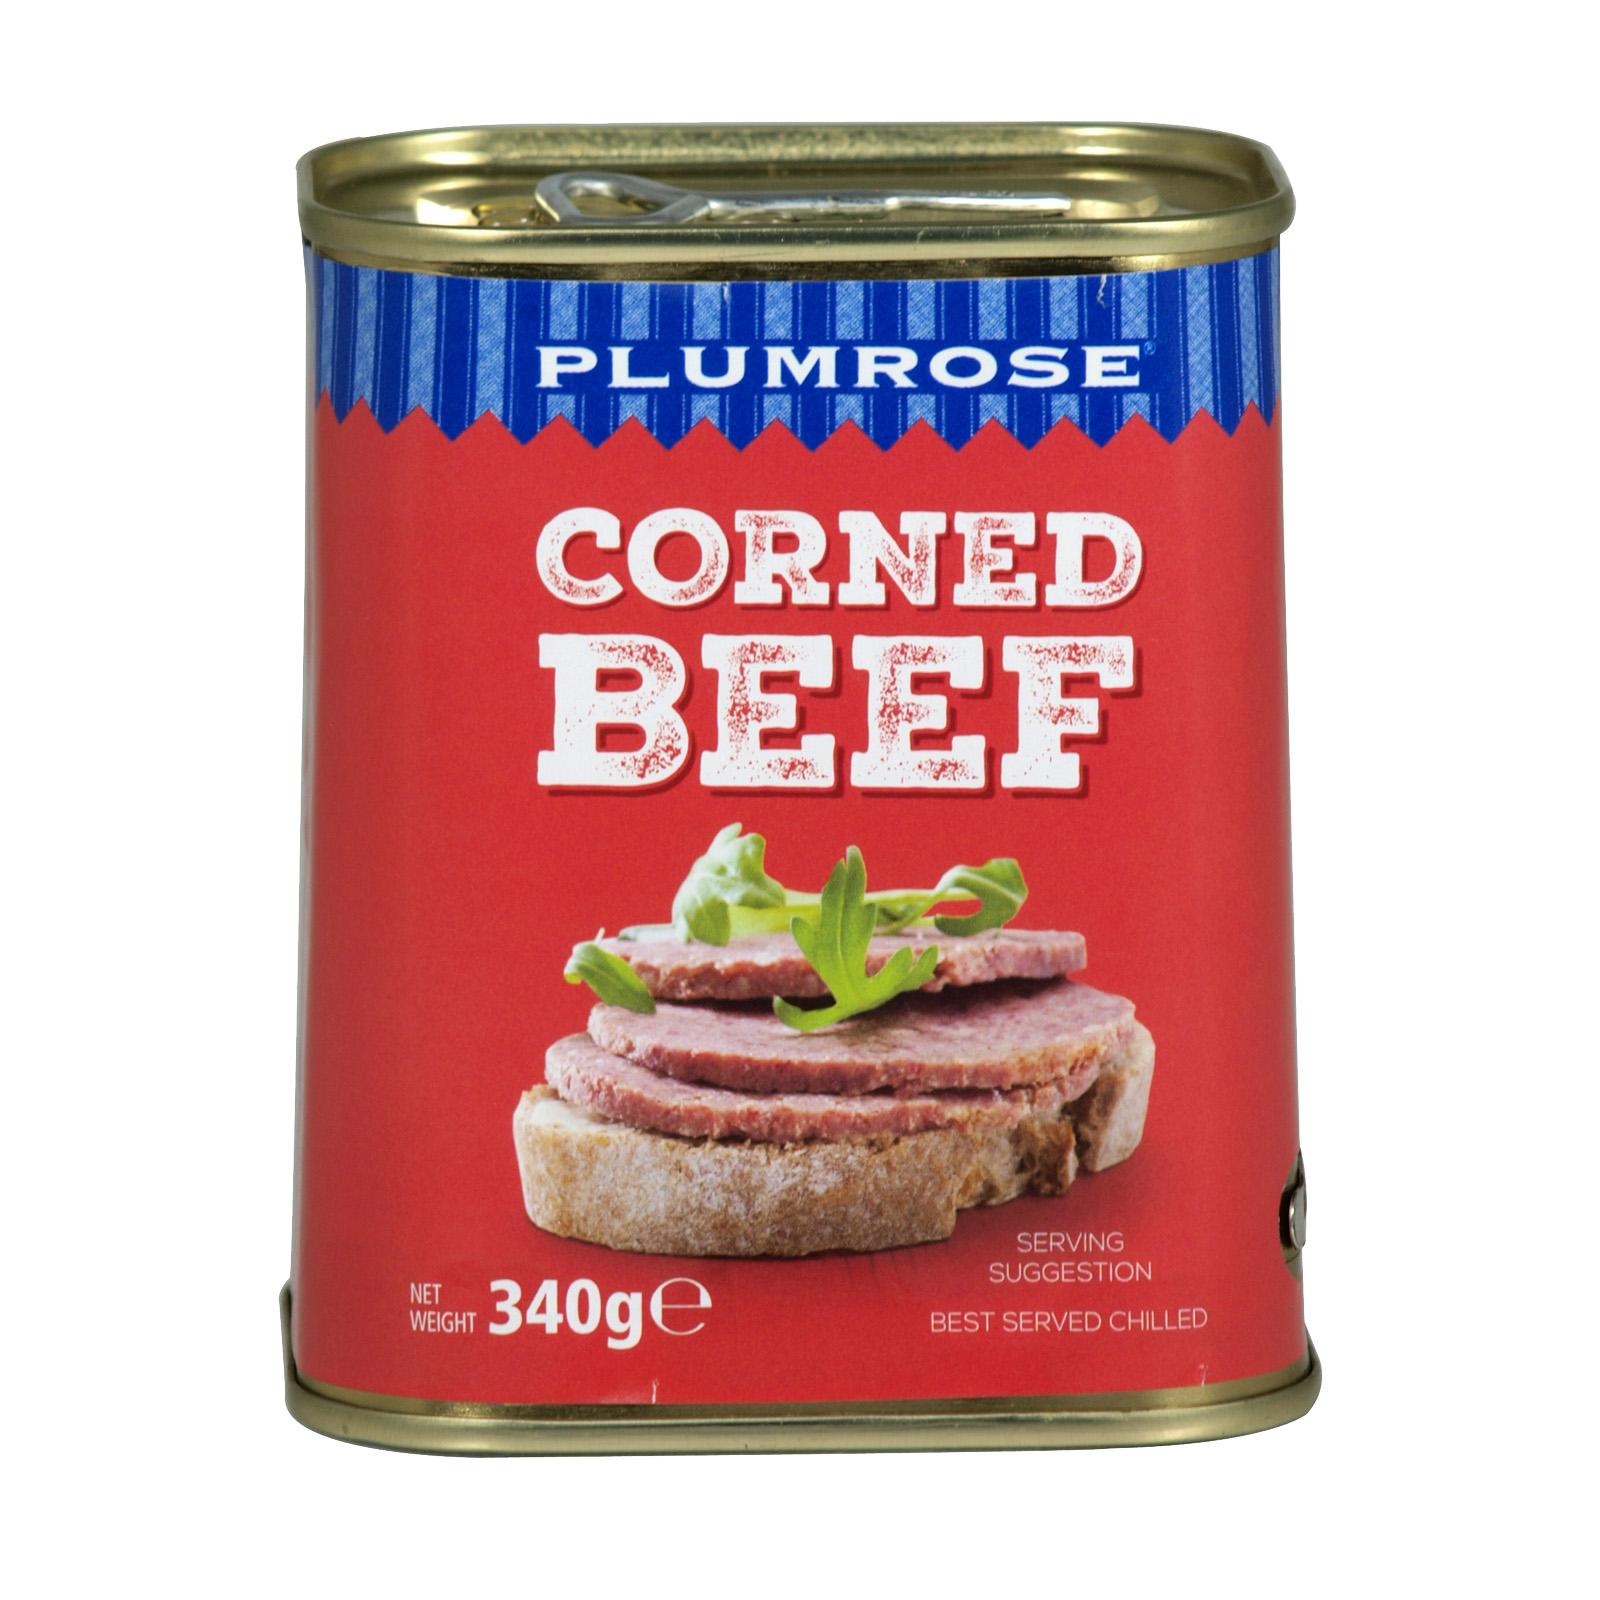 PLUMROSE CORNED BEEF 340GM PM ?2.79 X6